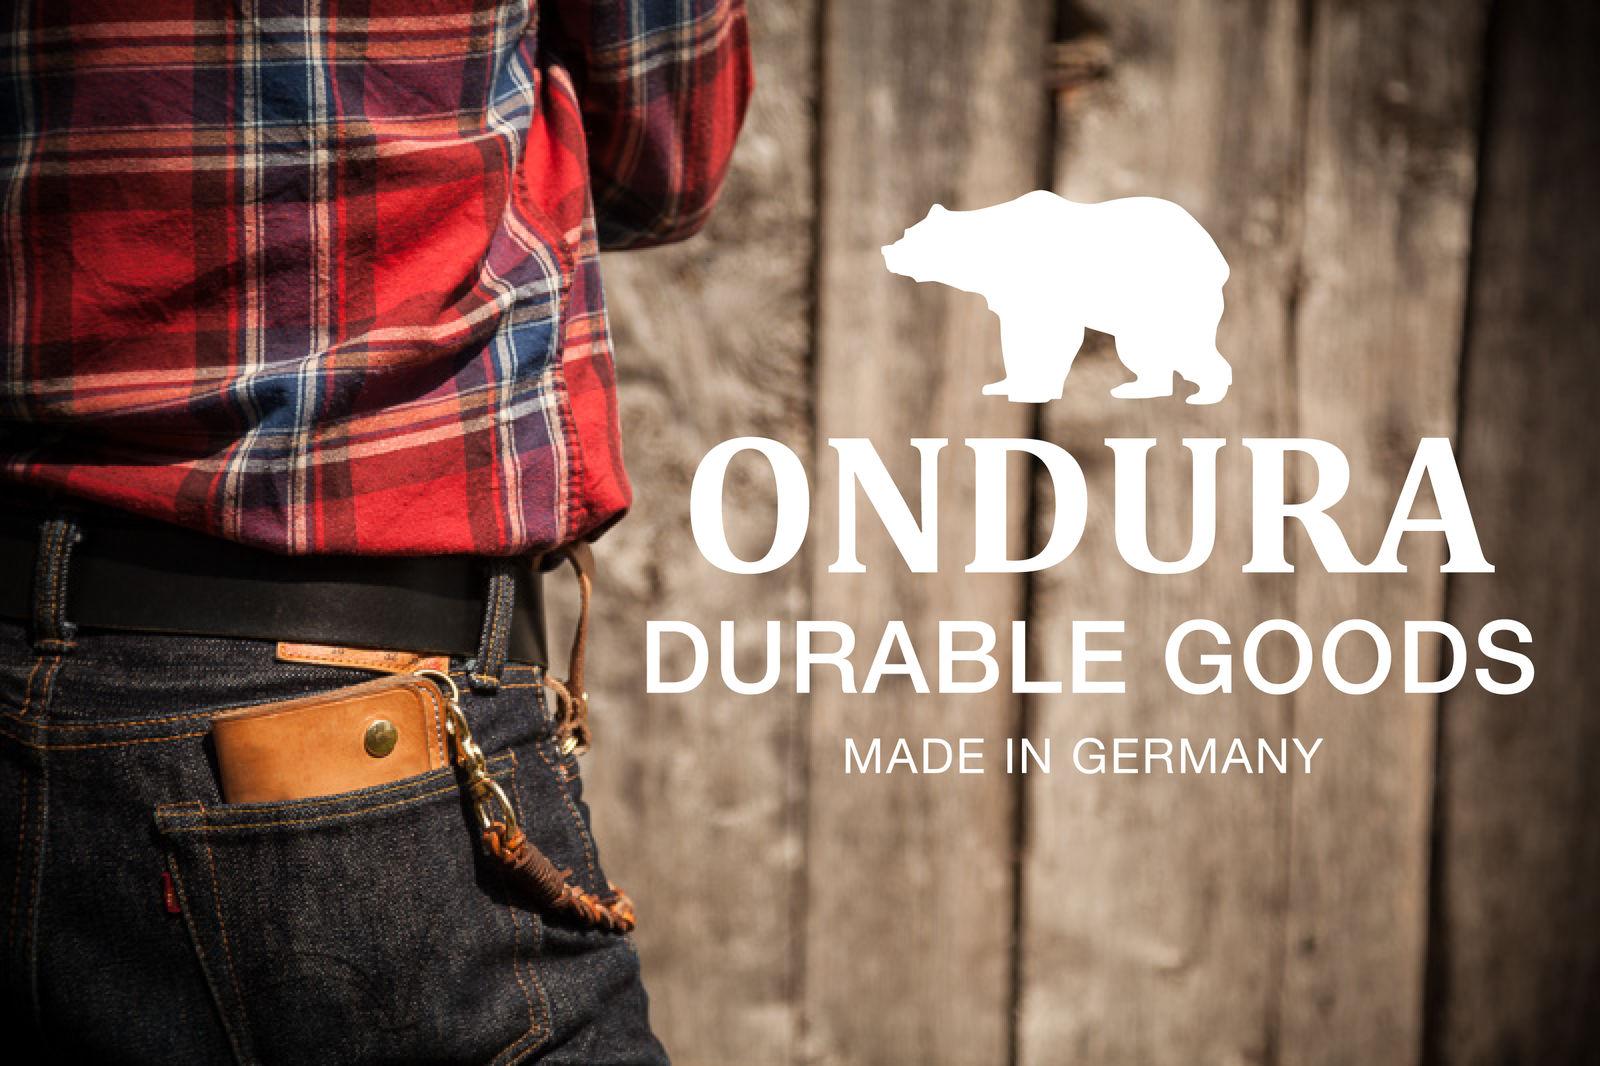 ONDURA durable goods